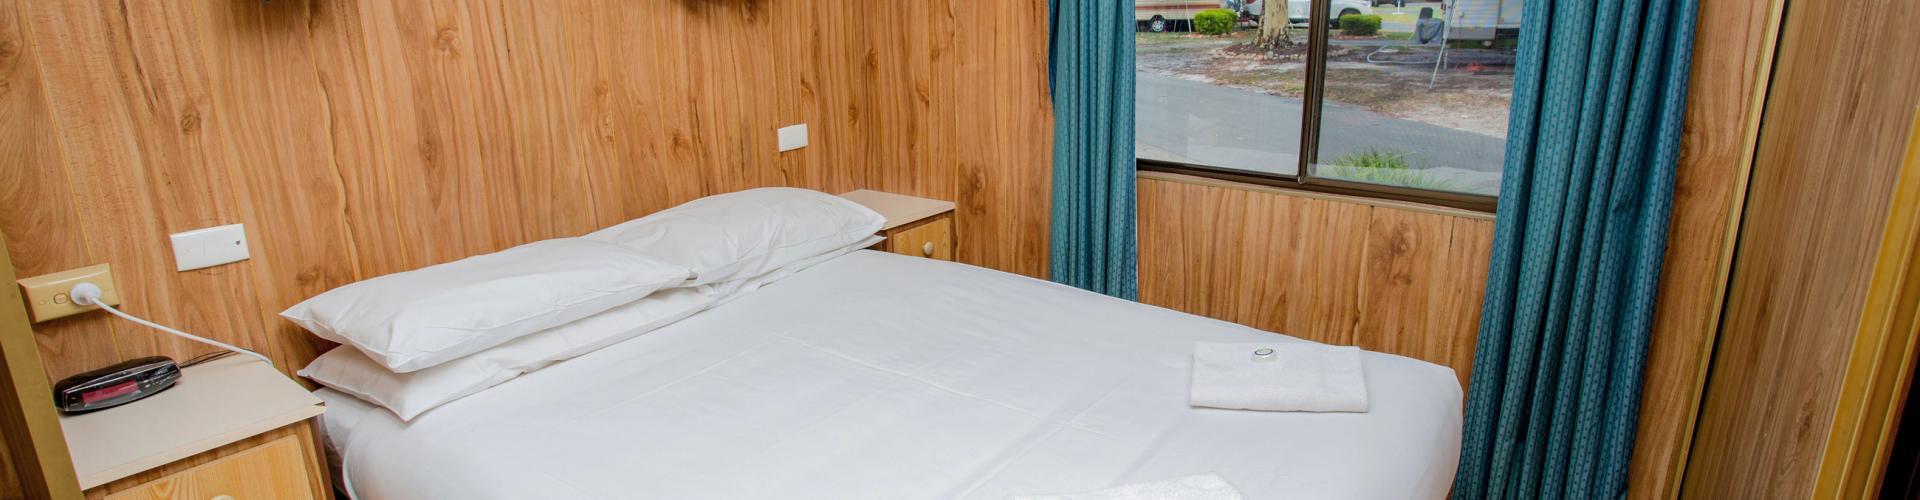 BIG4 Traralgon Park Lane Holiday Park - Budget Accommodation - Sleeps 4 - Bedroom